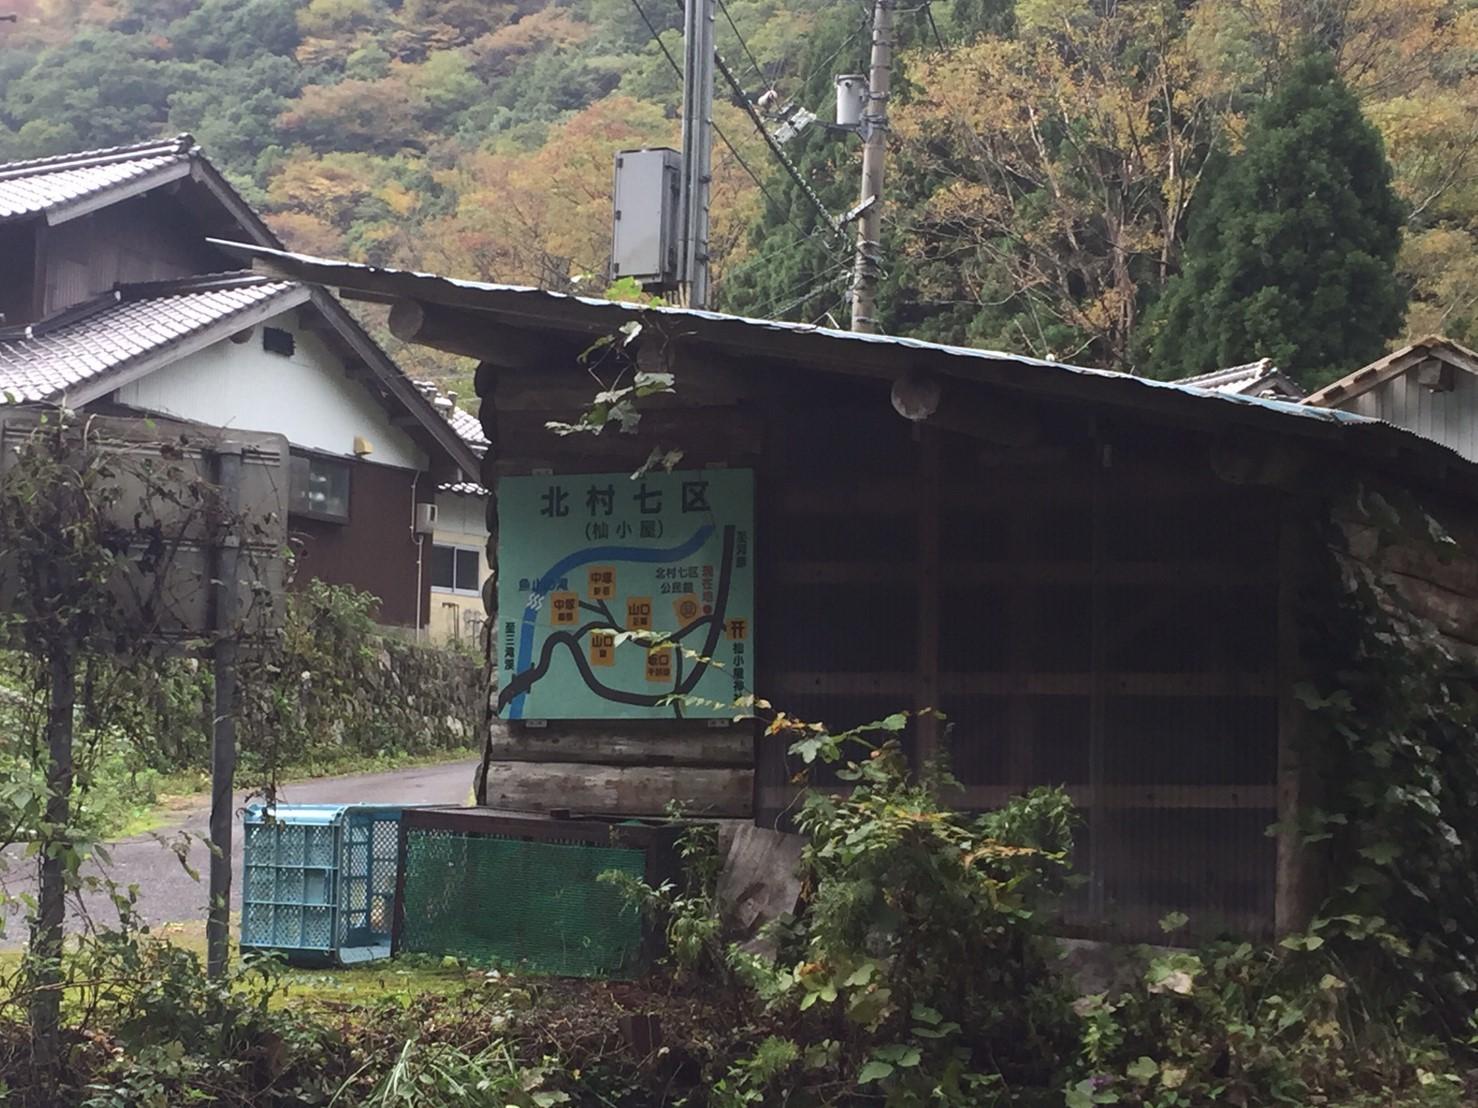 西郷工芸祭り・三滝渓_e0115904_16525770.jpg